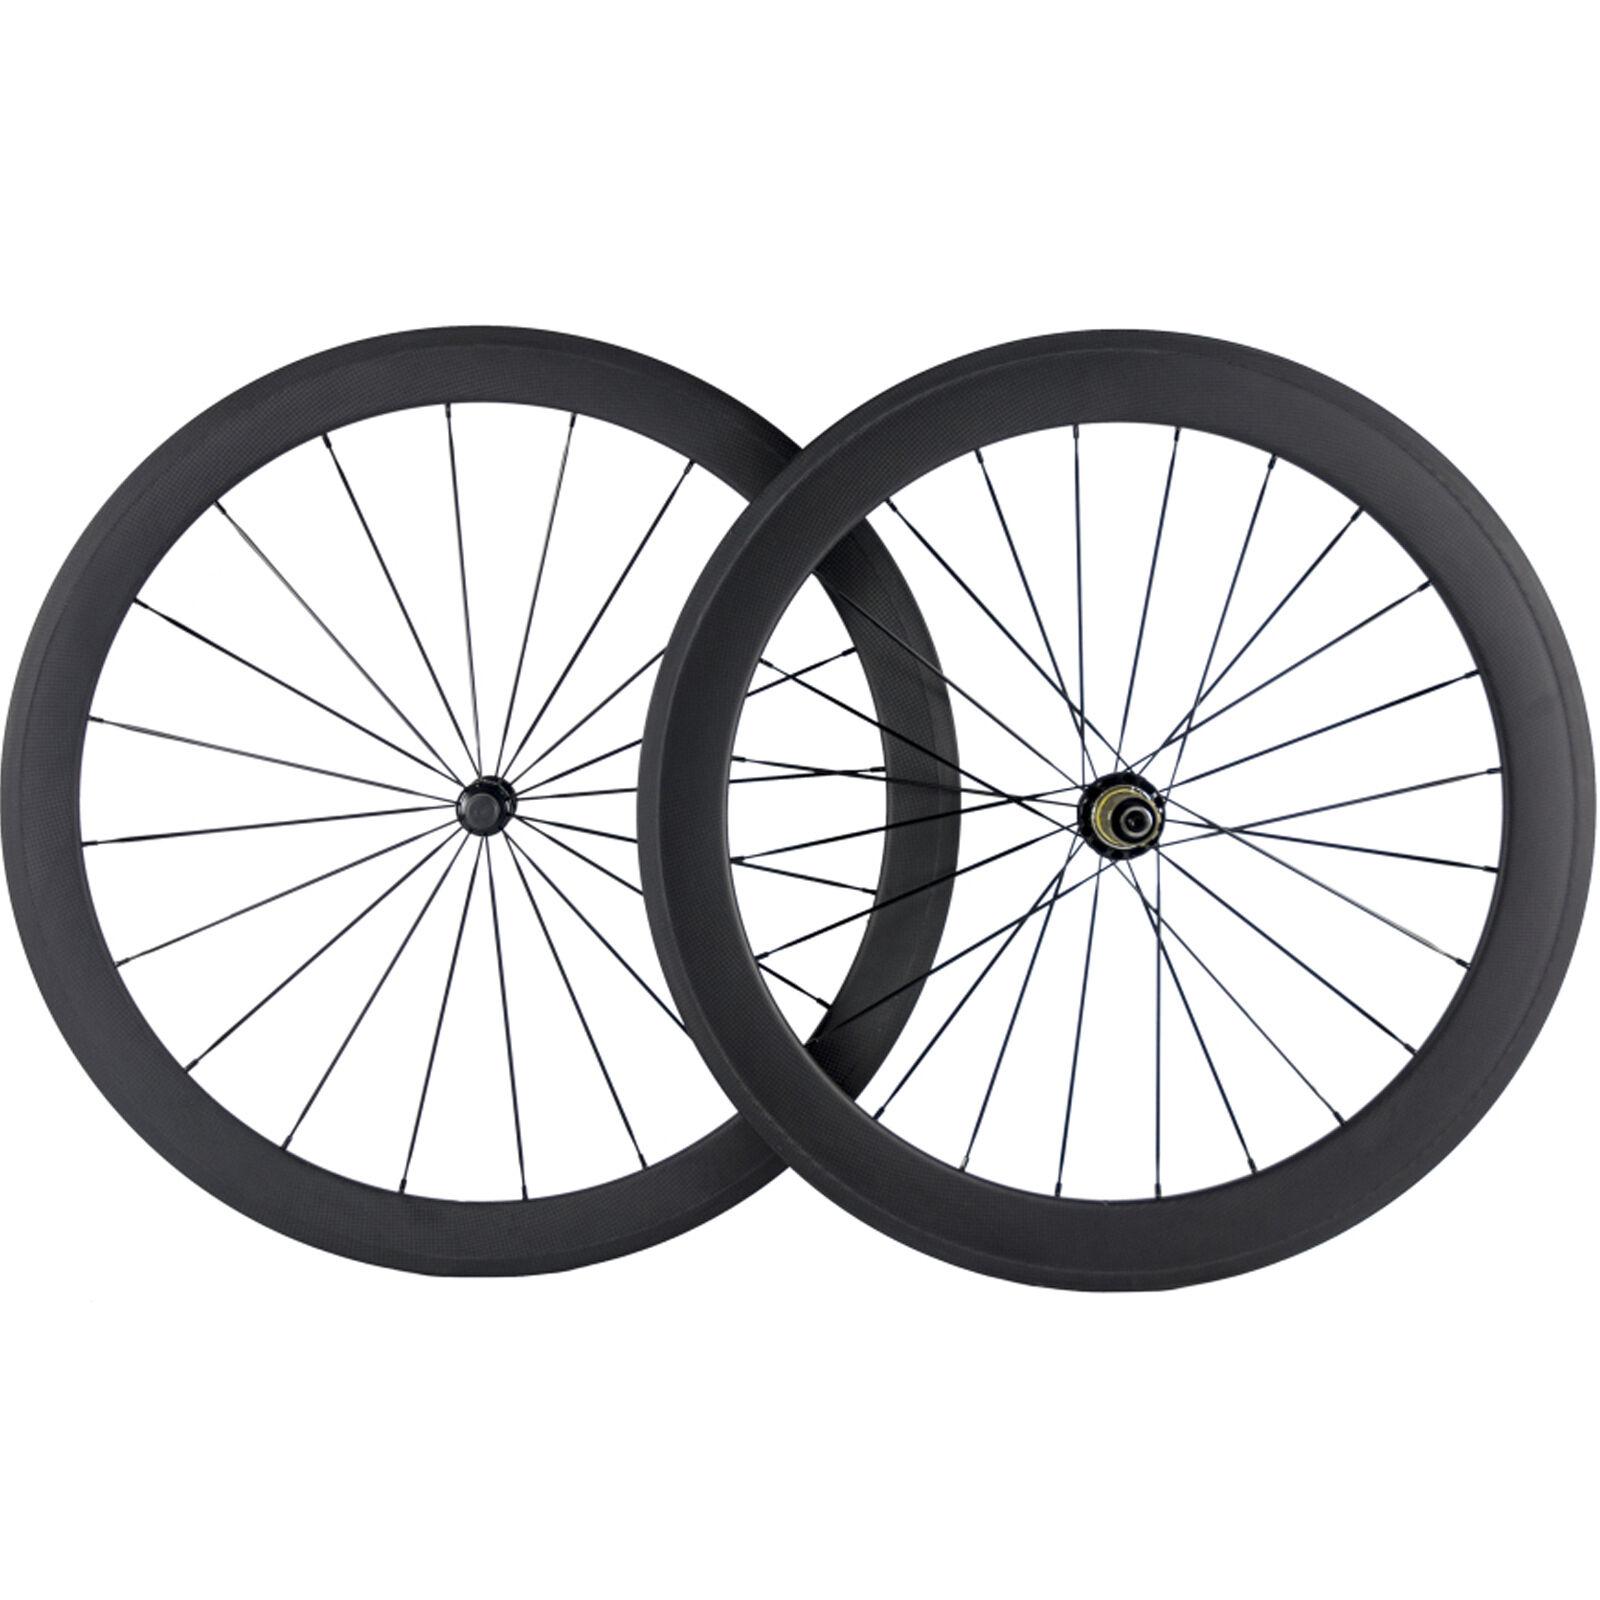 Full  Carbon Fibre Front 50mm Carbon Wheelset Clincher Rear 60mm Carbon Road Whee  export outlet